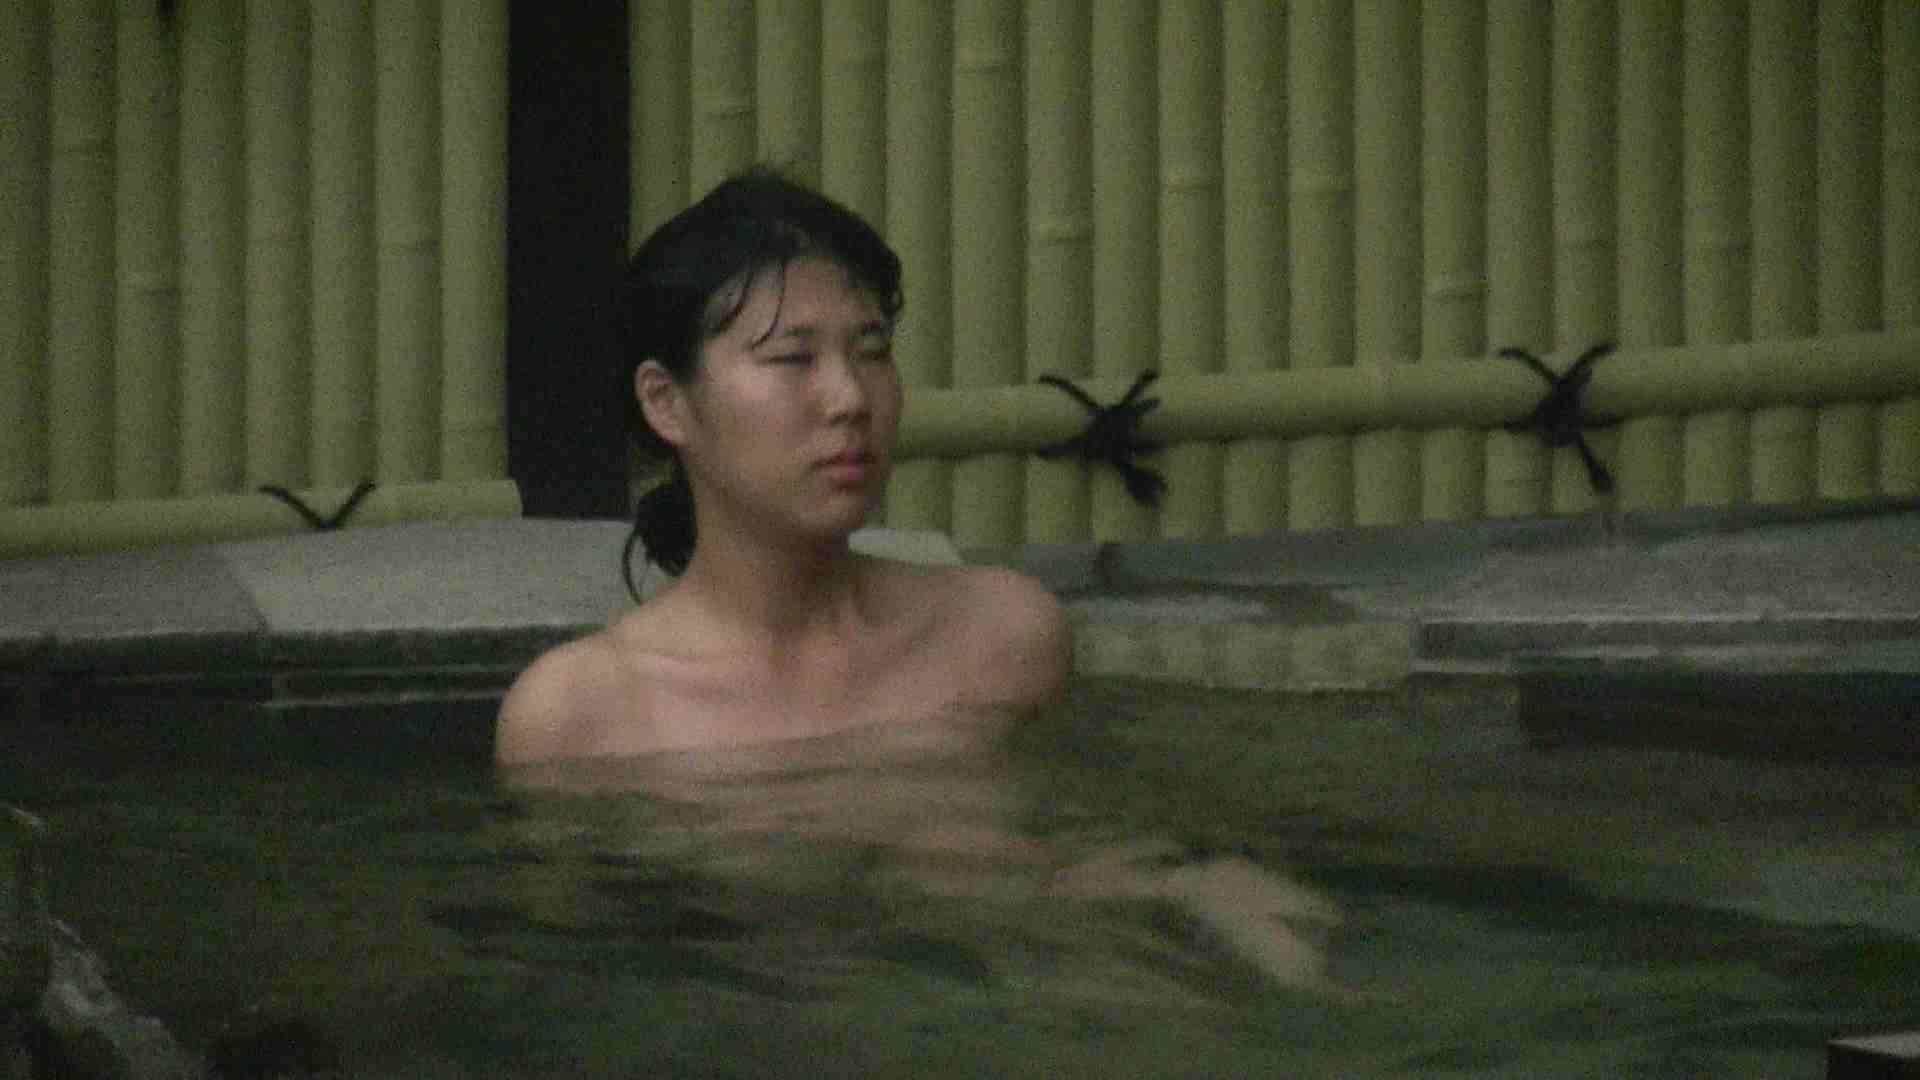 Aquaな露天風呂Vol.215 盗撮 おまんこ無修正動画無料 106枚 41